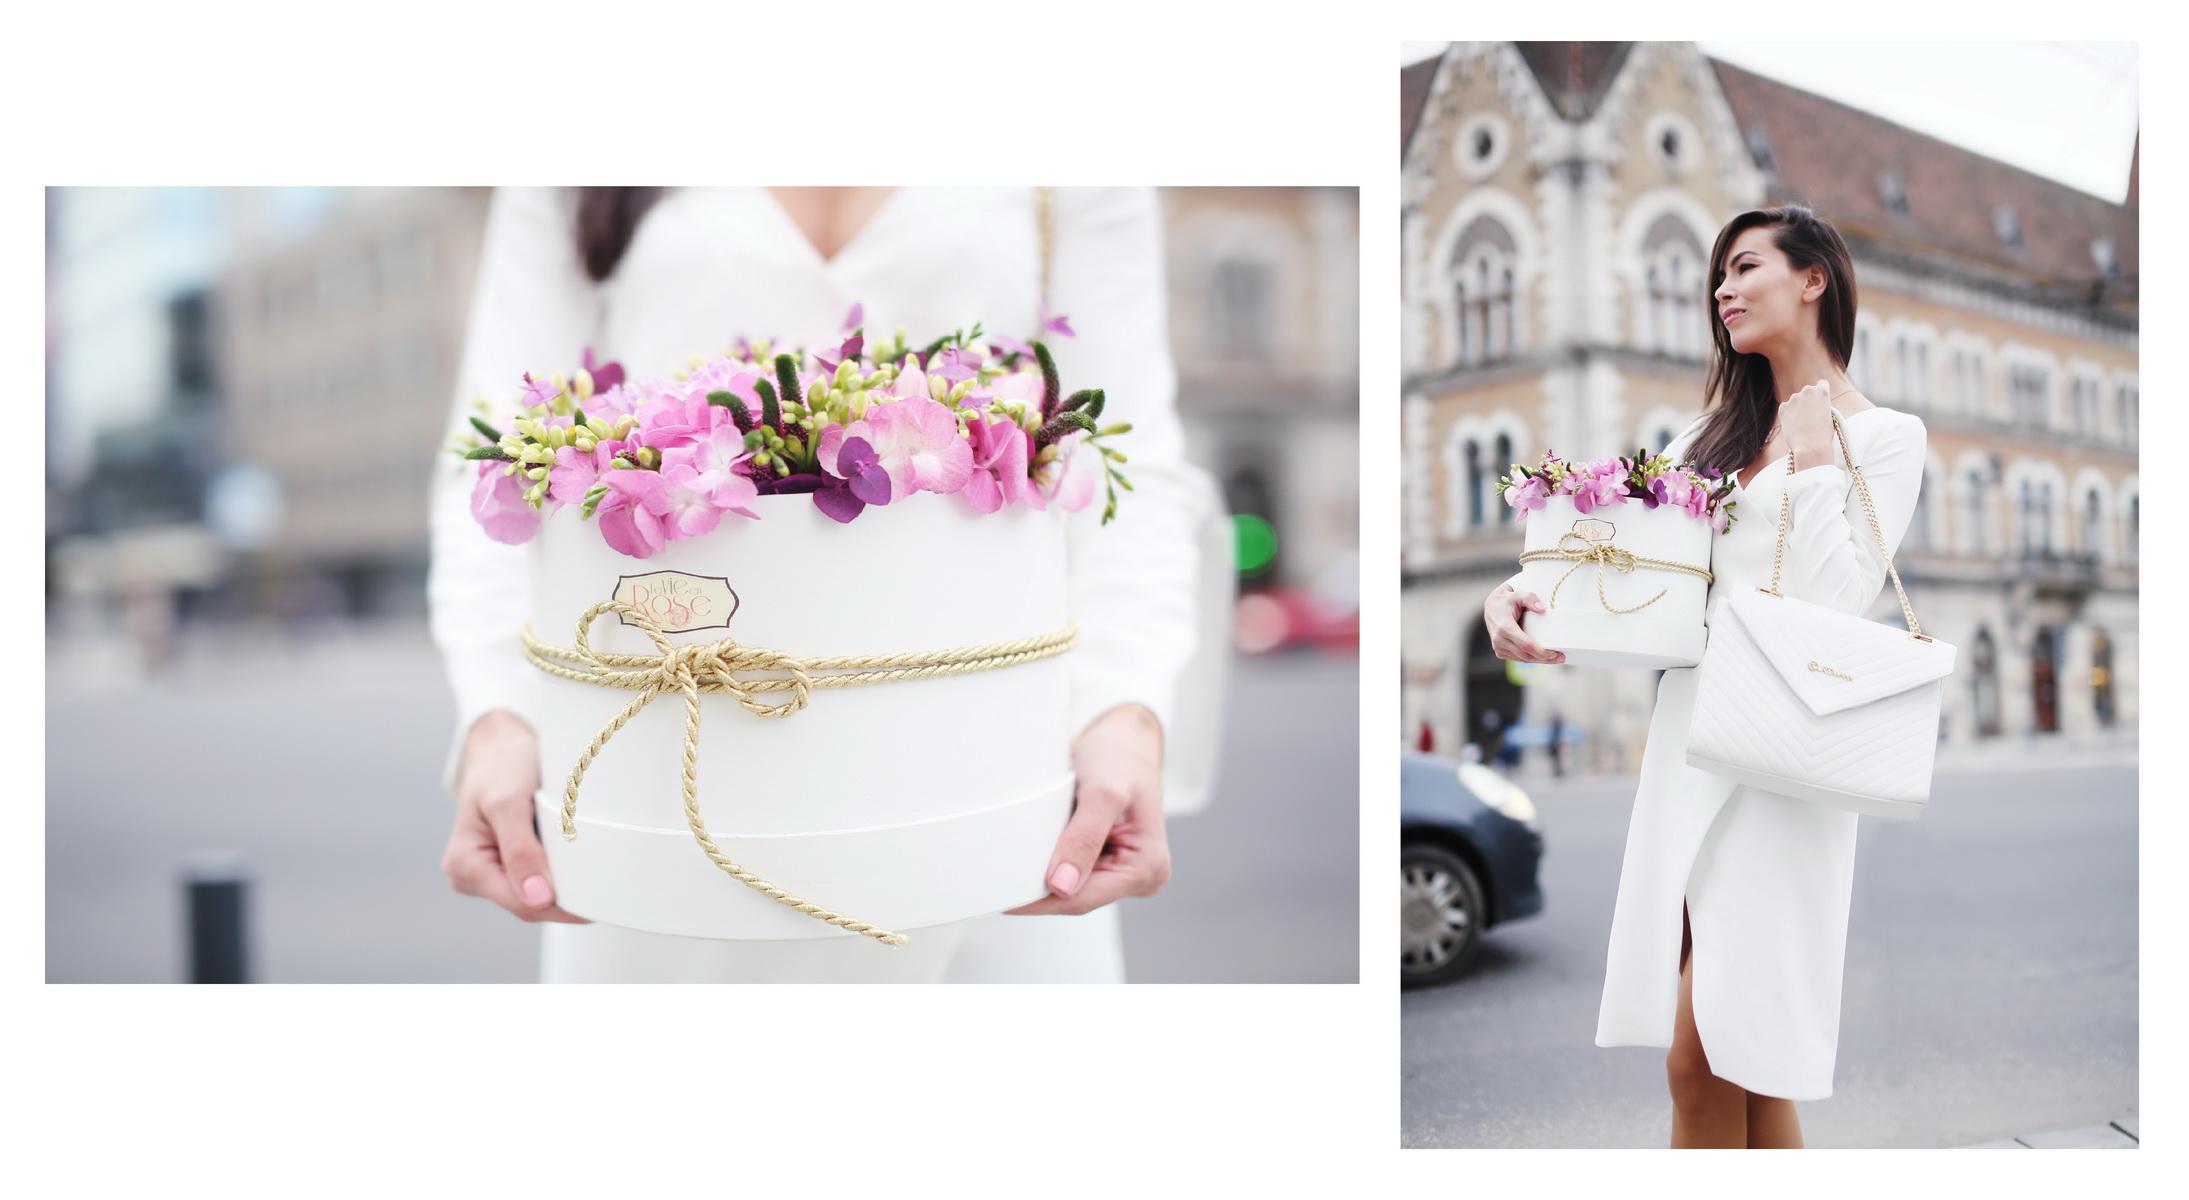 Kurtman Bags Giveaway Flowers